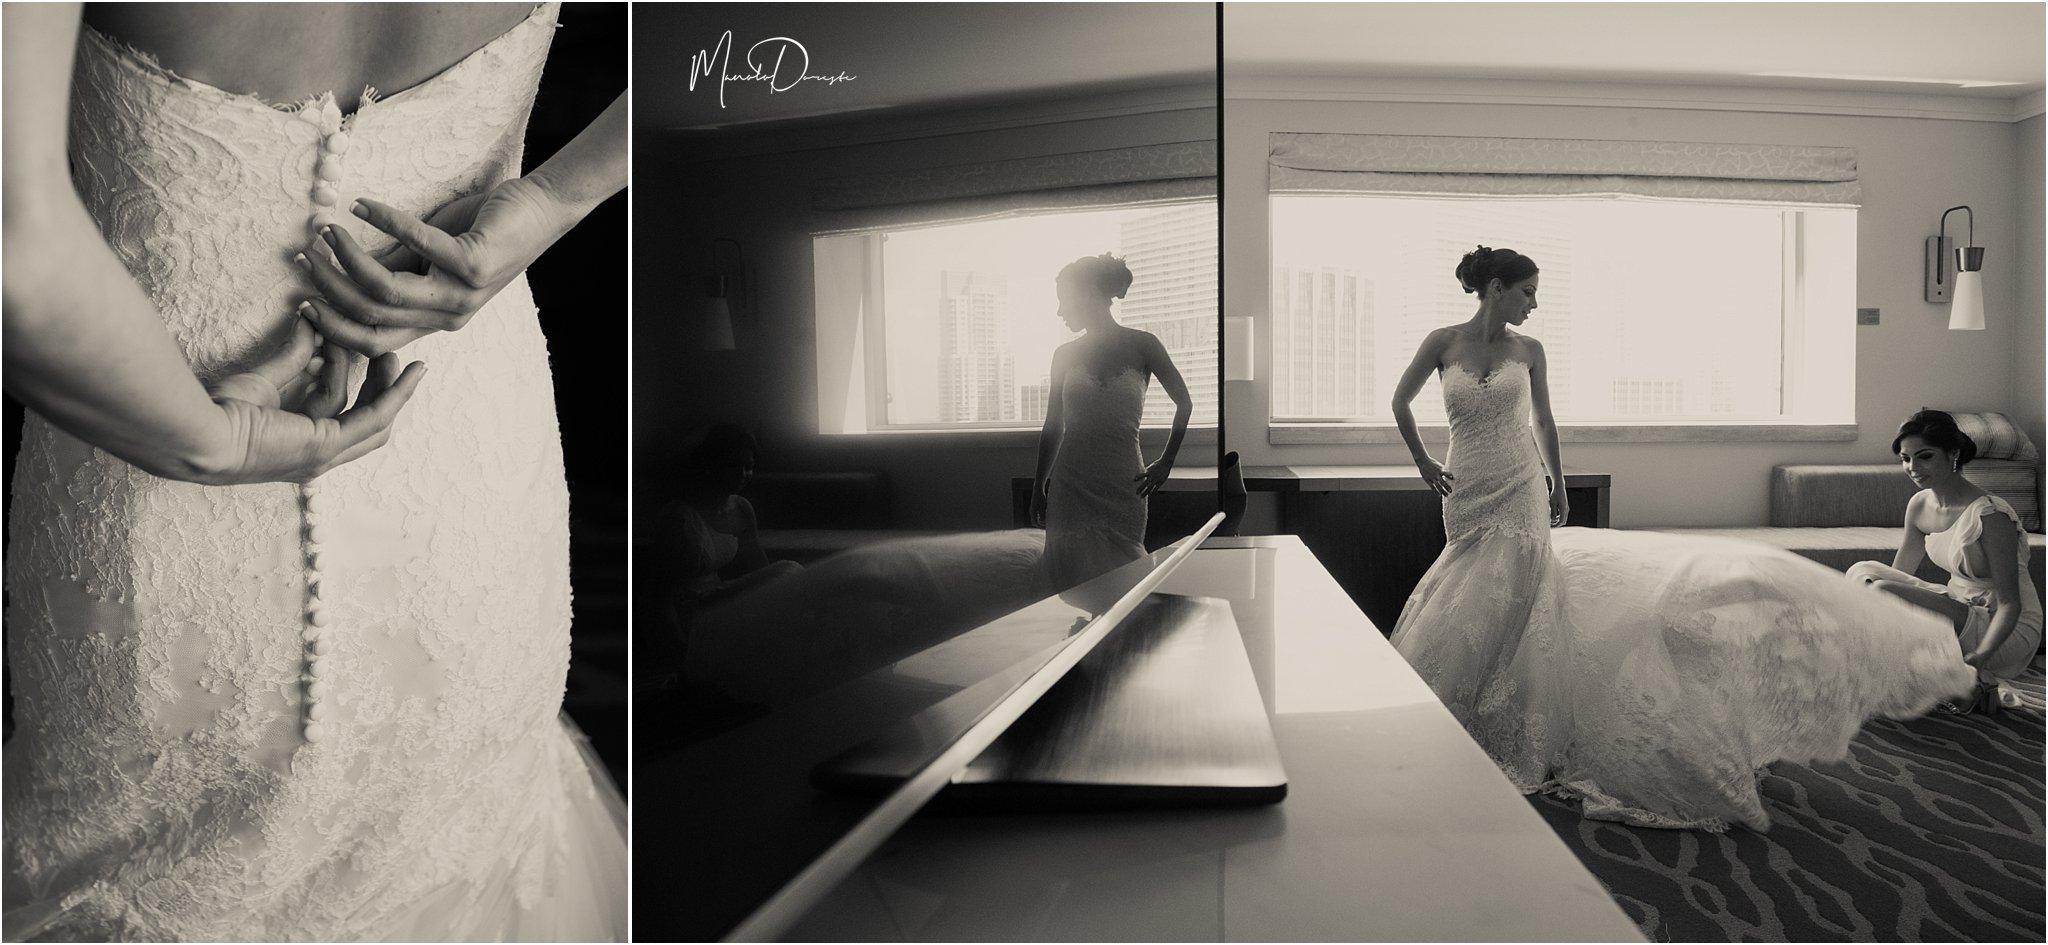 00747_ManoloDoreste_InFocusStudios_Wedding_Family_Photography_Miami_MiamiPhotographer.jpg